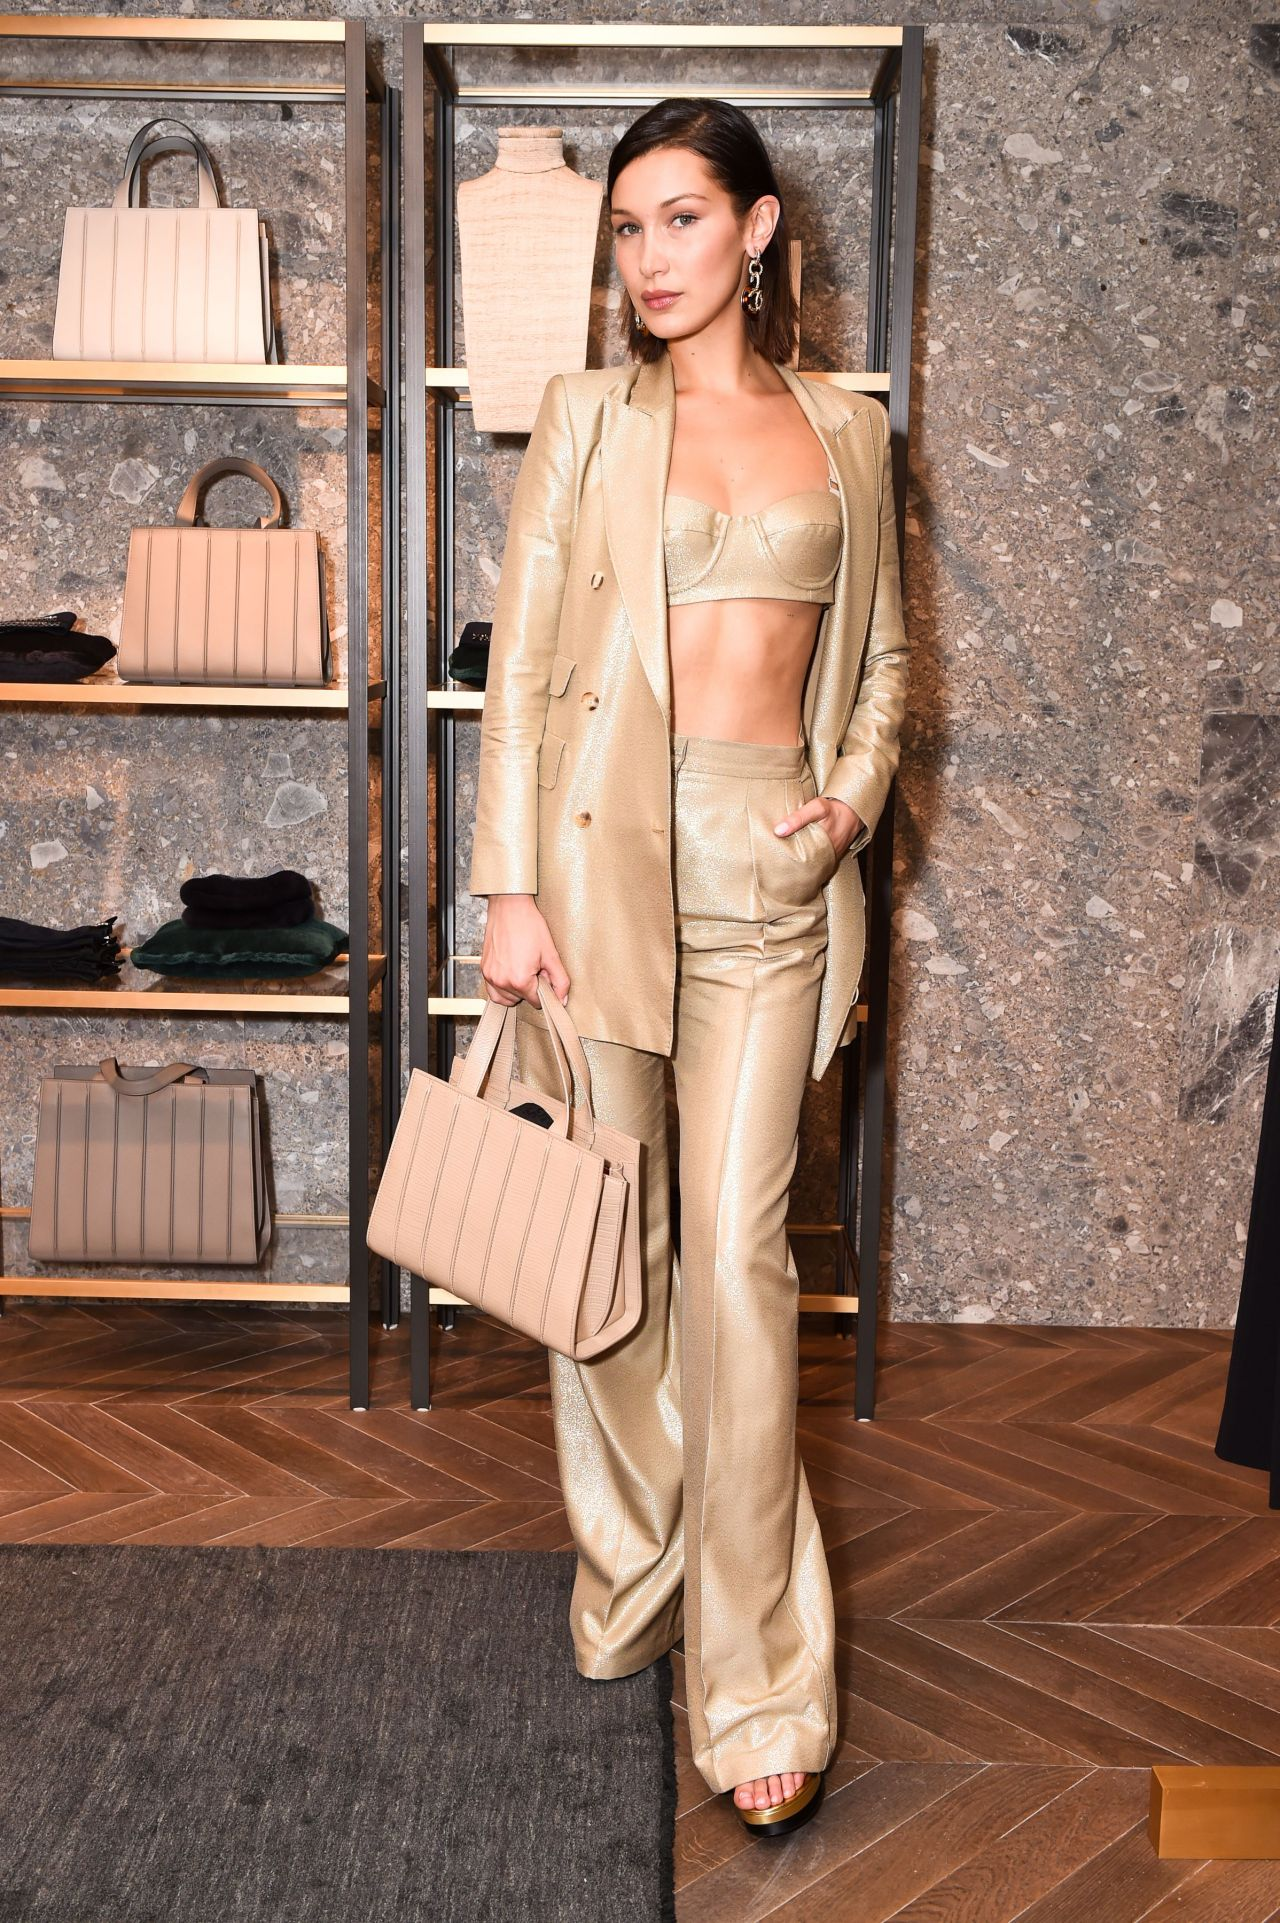 Bella Hadid - Max Mara Boutique Reopening - New York Fashion Week 09/08/2017